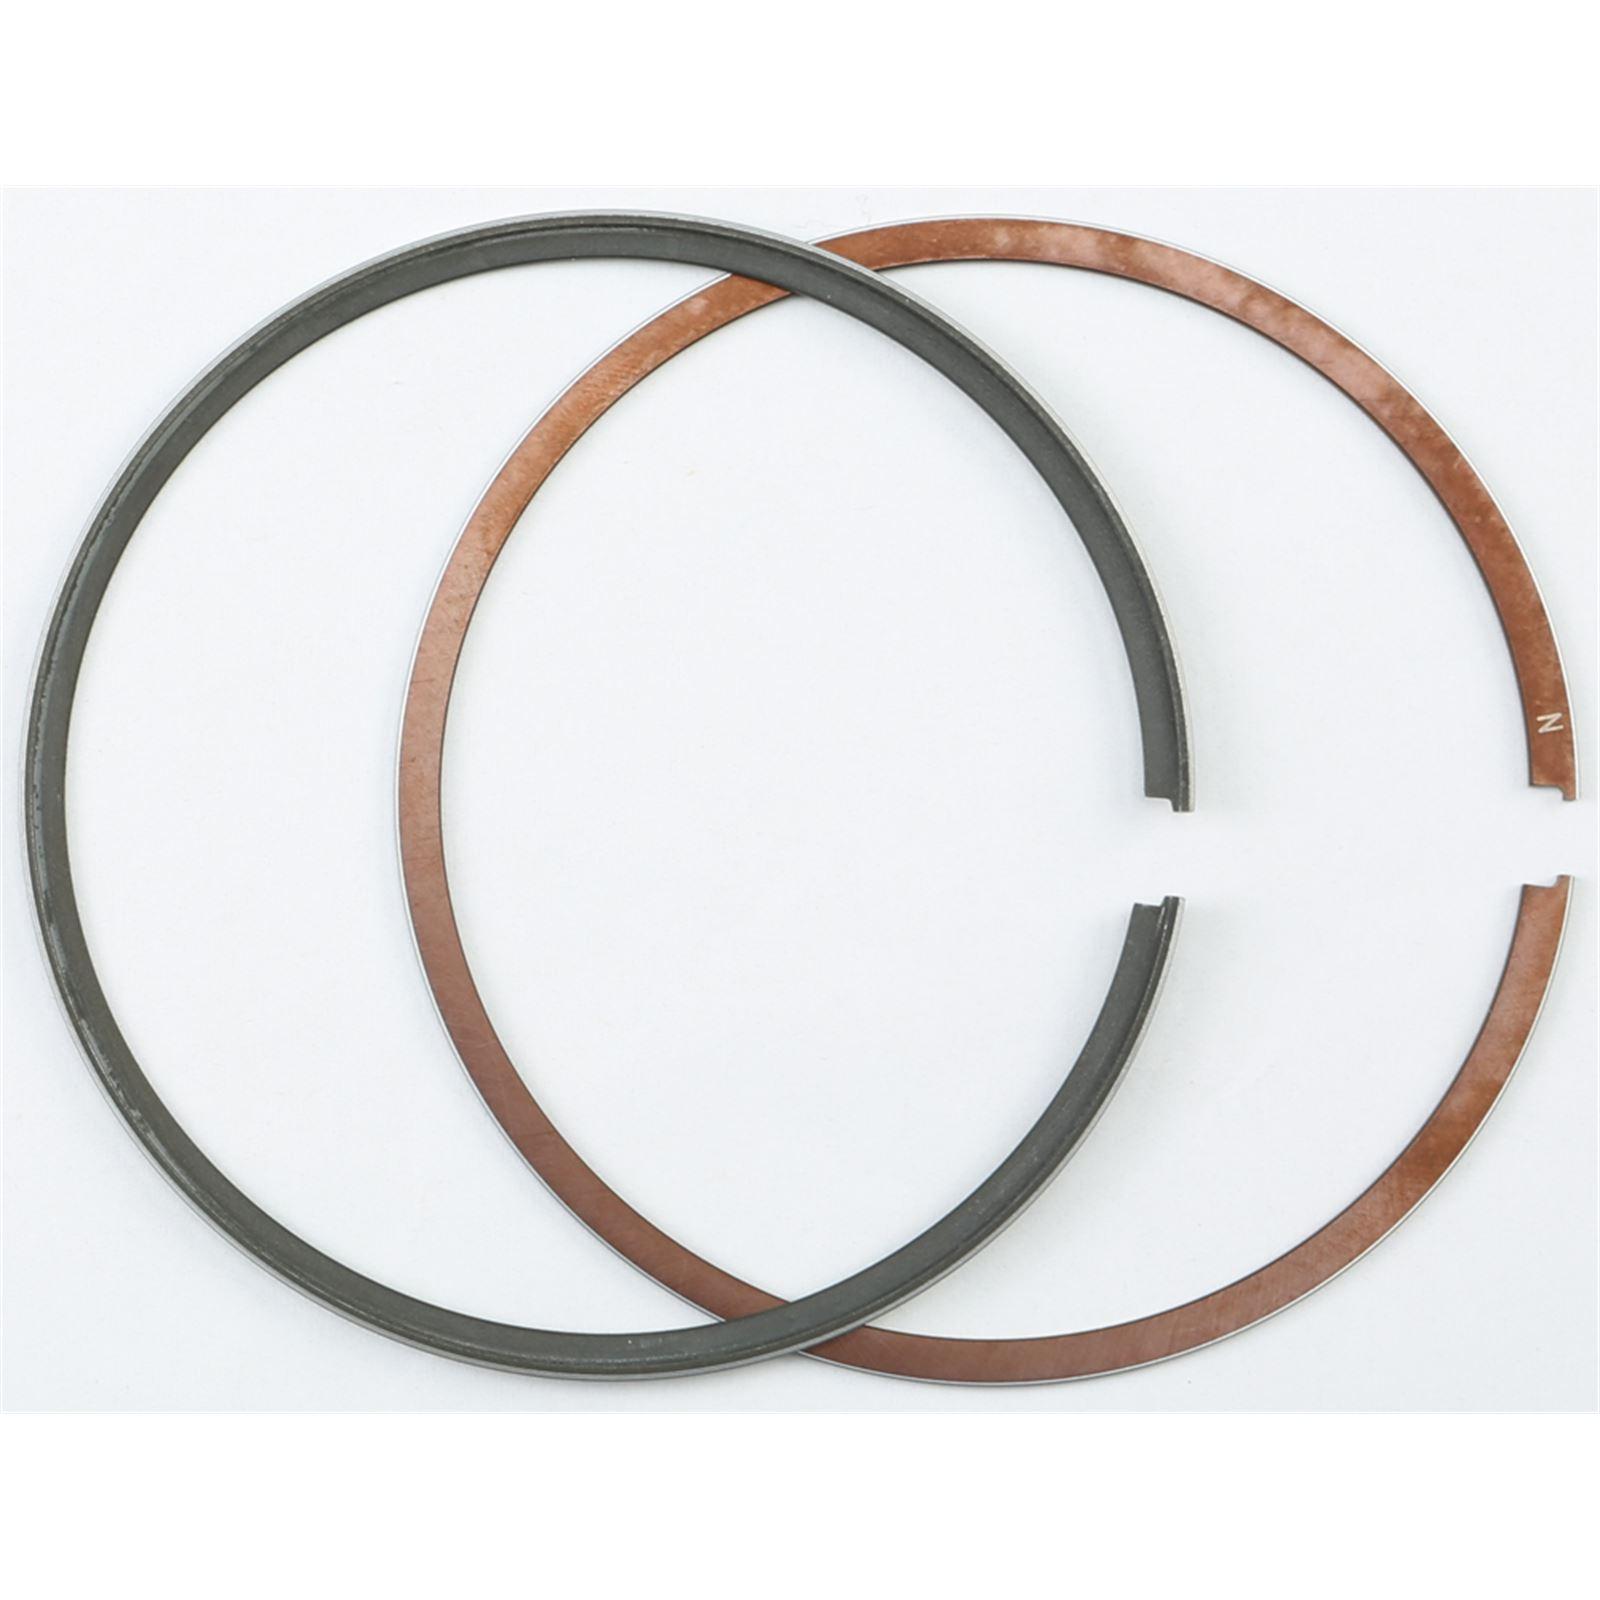 Wiseco Piston Ring Set